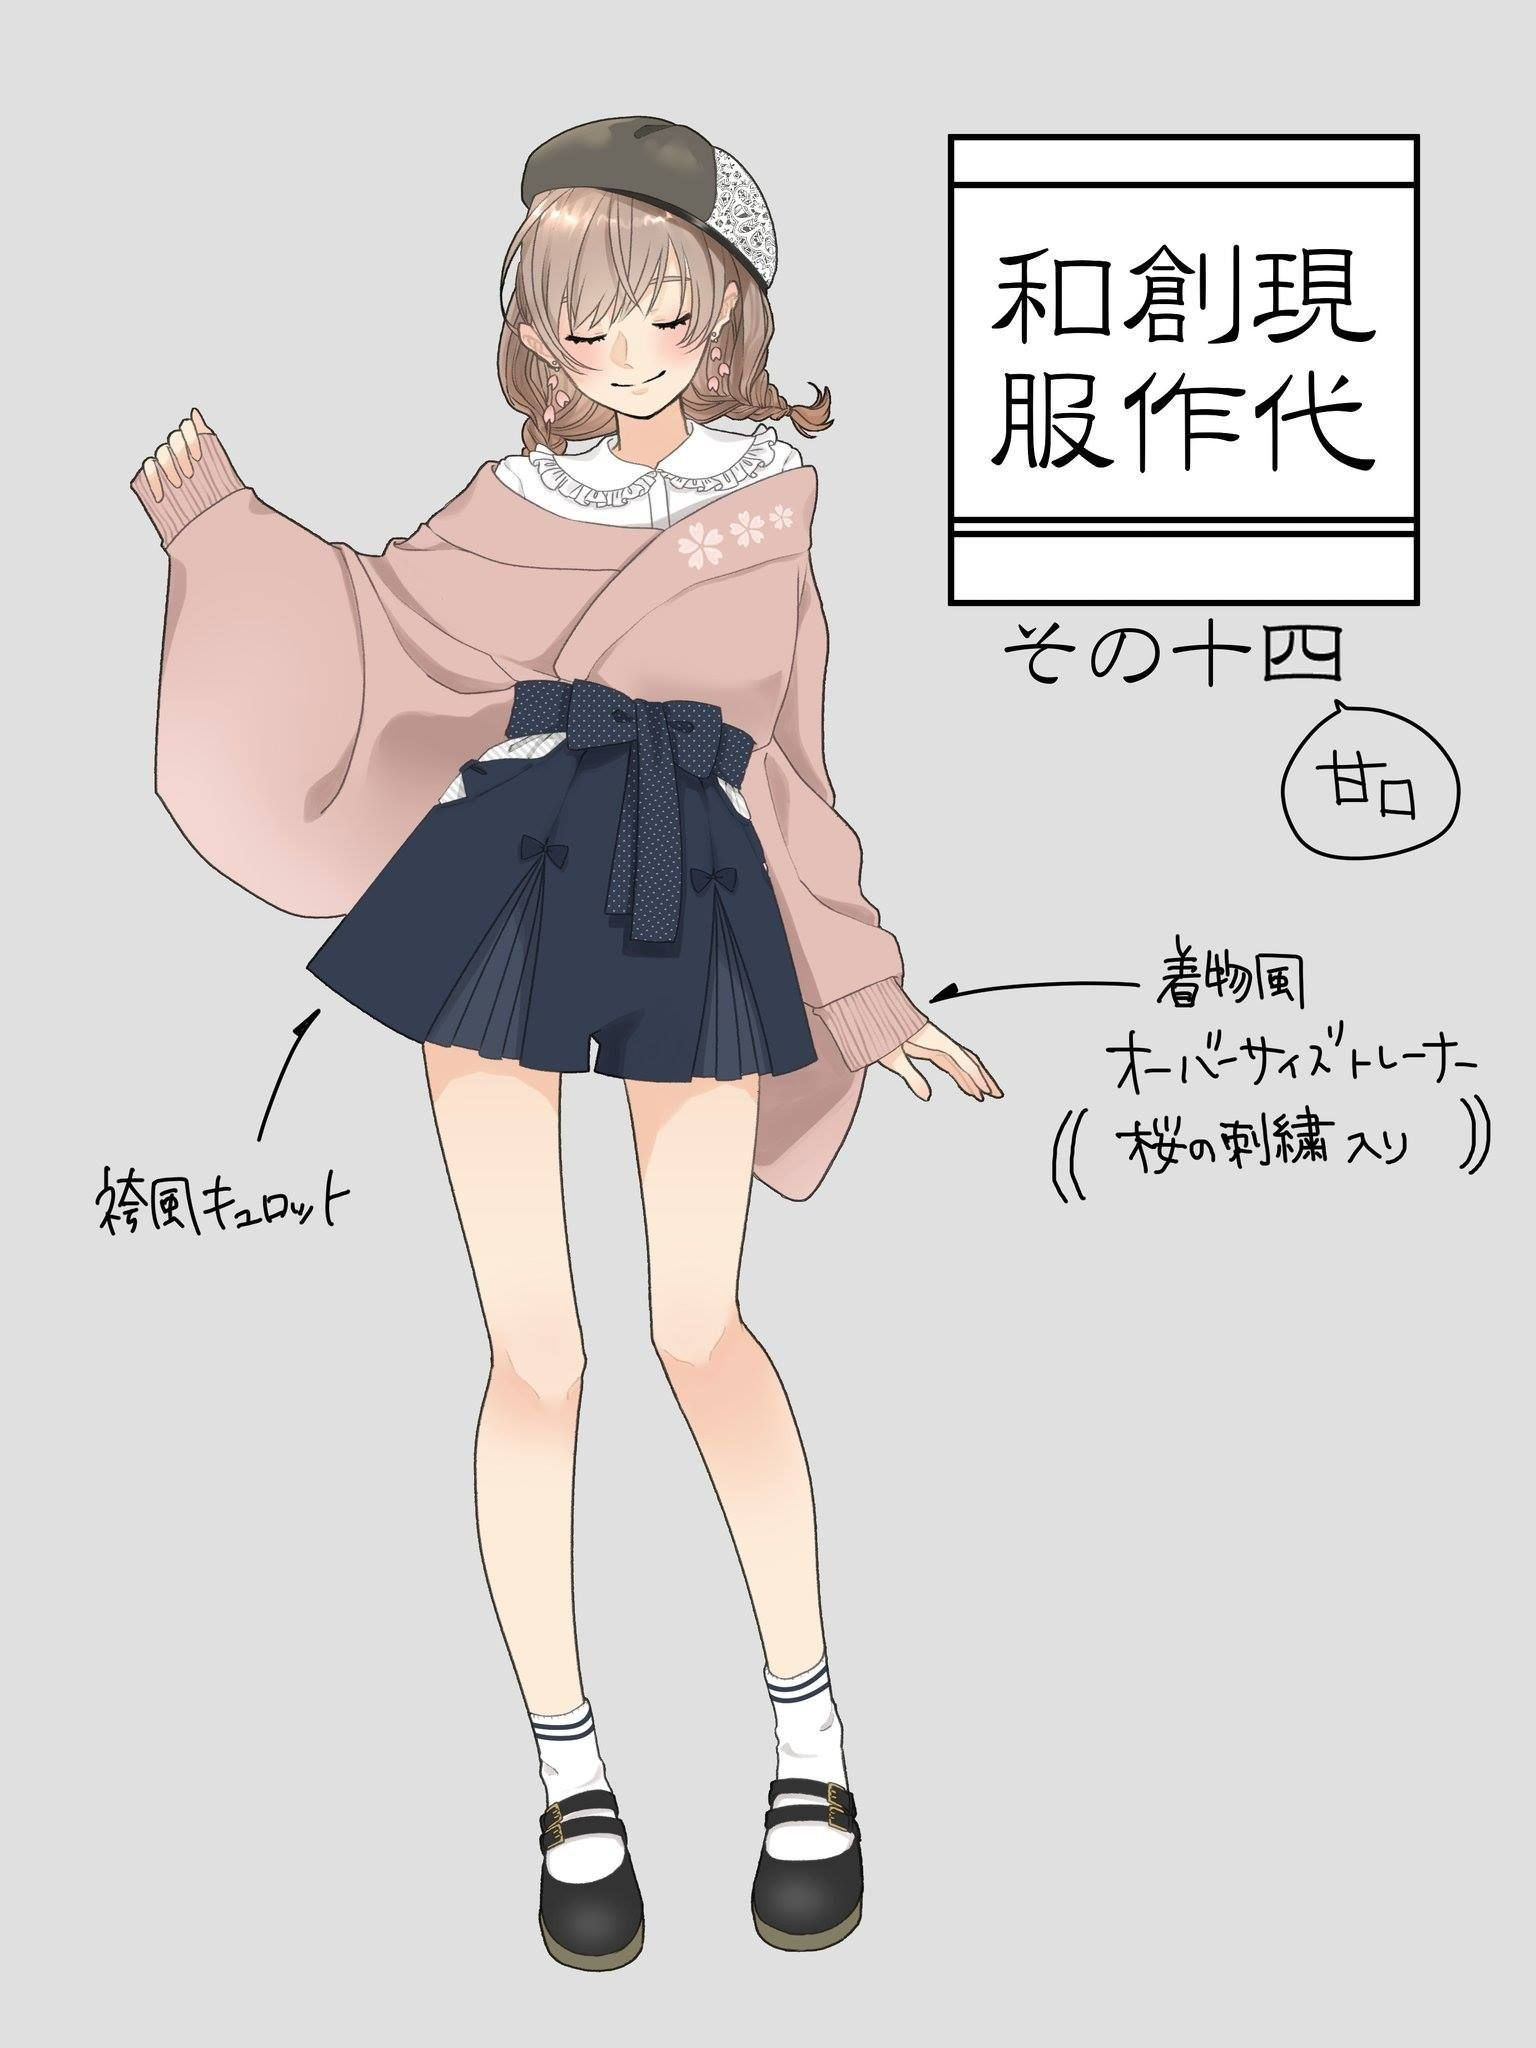 artist 花月 和ンピ販売中 twitter haruharu sunny アニメの服を描く 和風 洋服 ファッションデザイン画